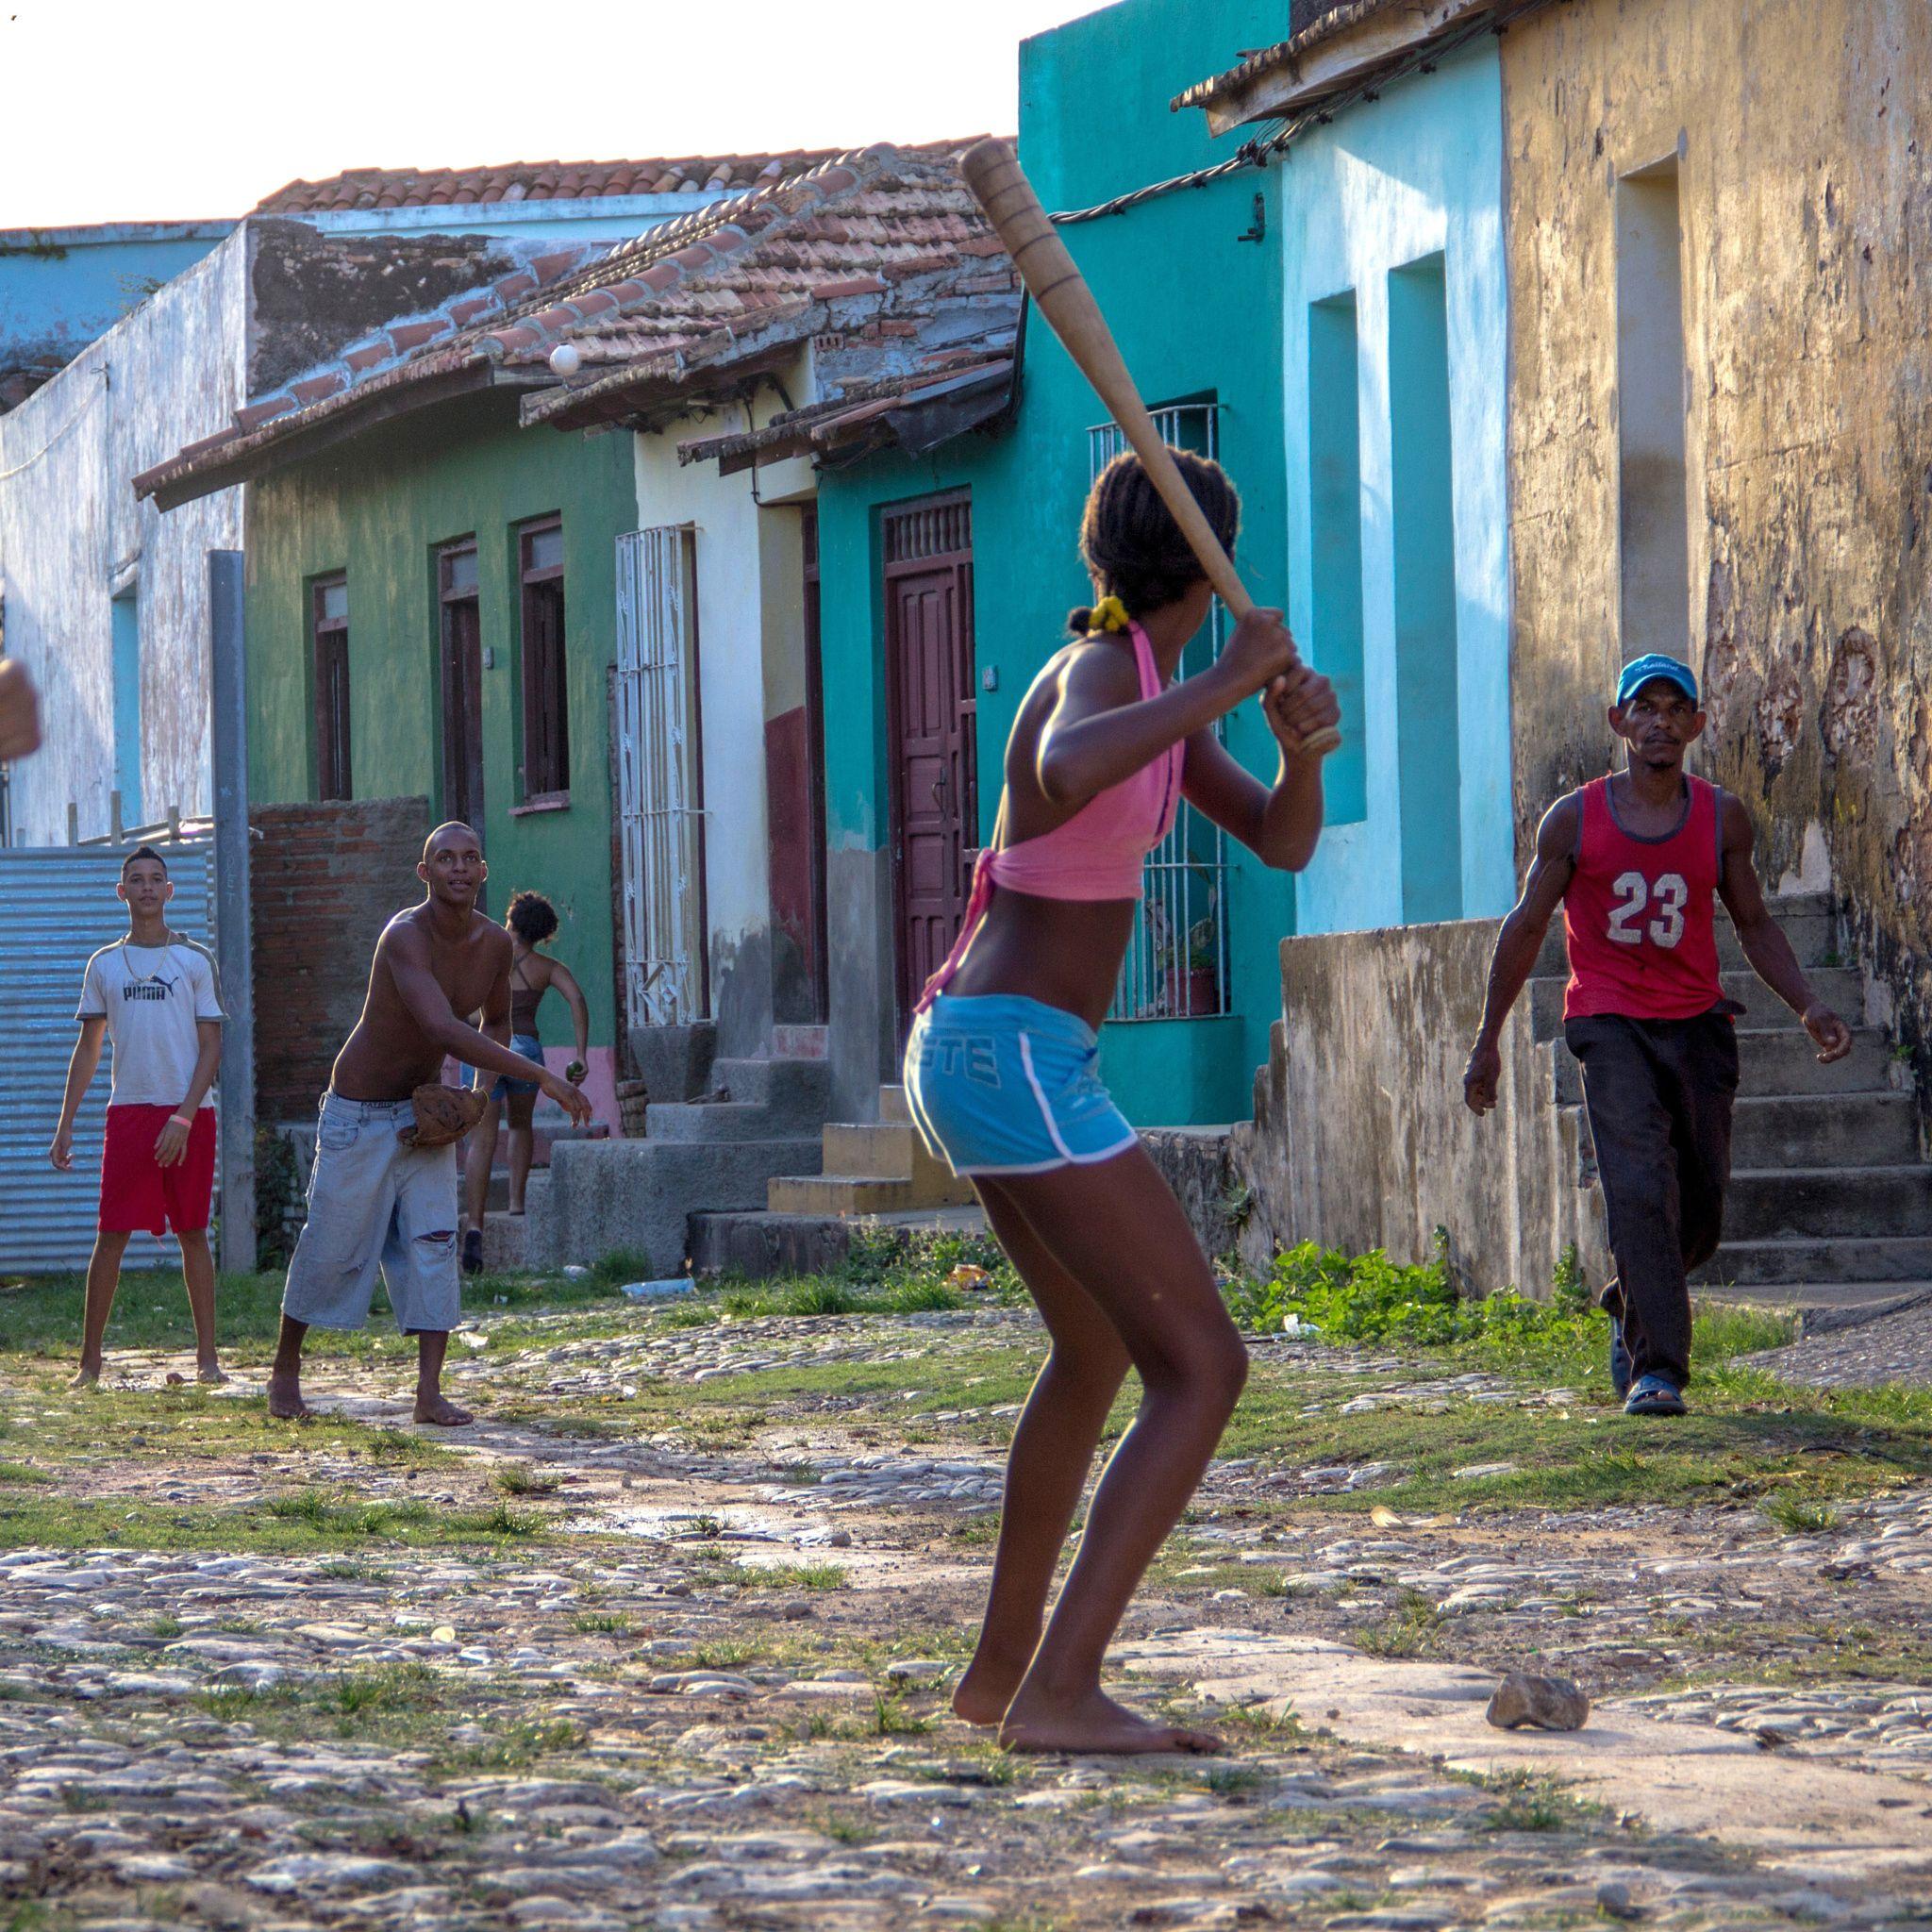 Baseball in trinidad a bunch of cuban kids playing